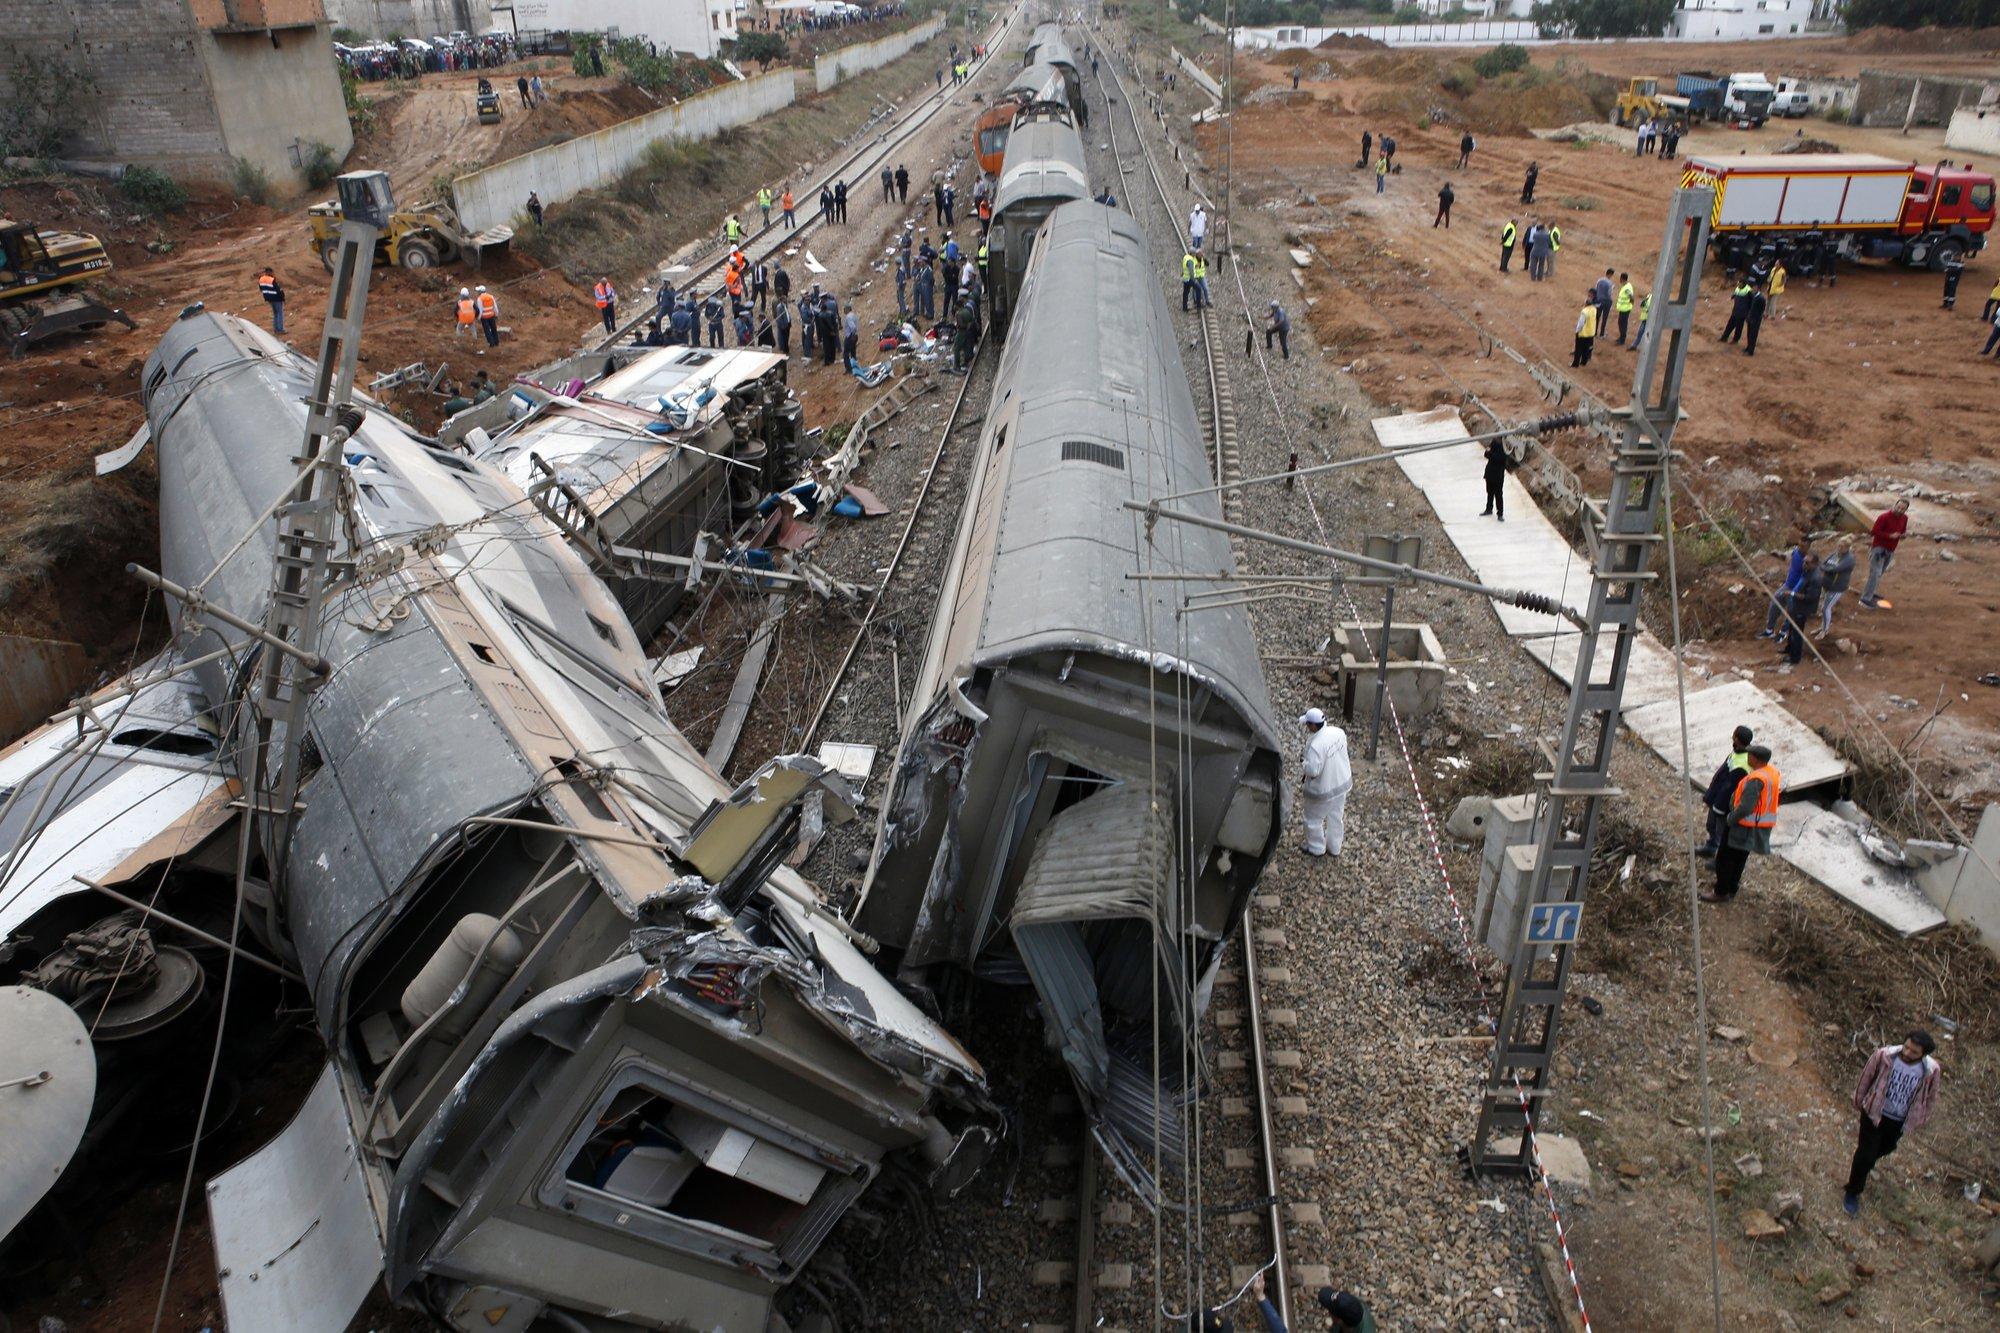 Train derailed in Morocco_1539724986765.jpg.jpg